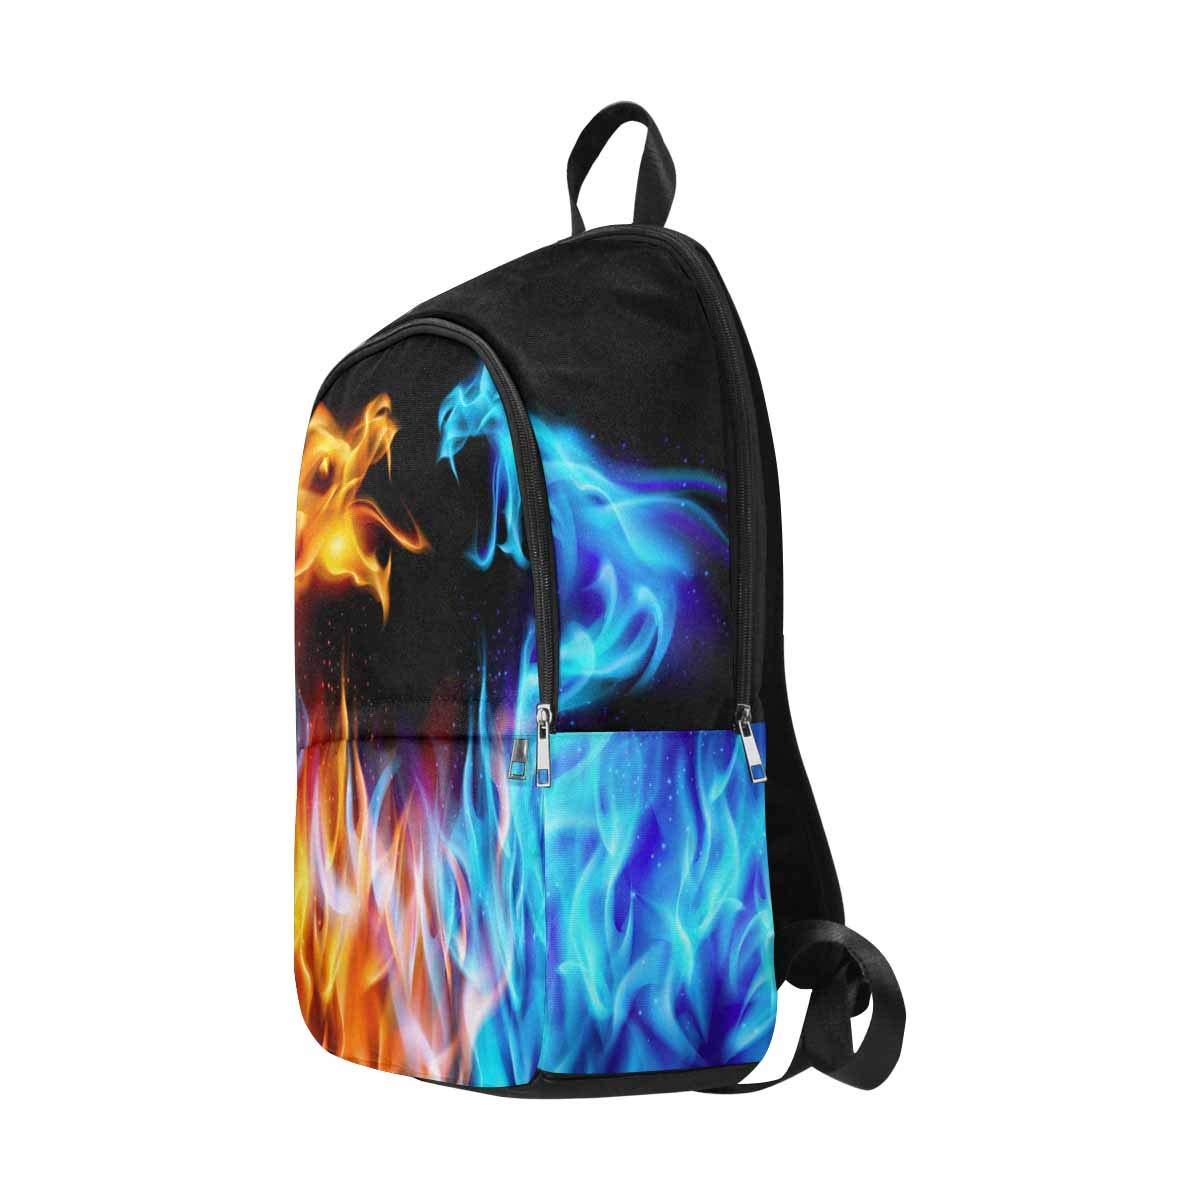 InterestPrint Blue Red Fiery Dragons Custom Casual Travel Laptop Backpack Bookbag Daypack